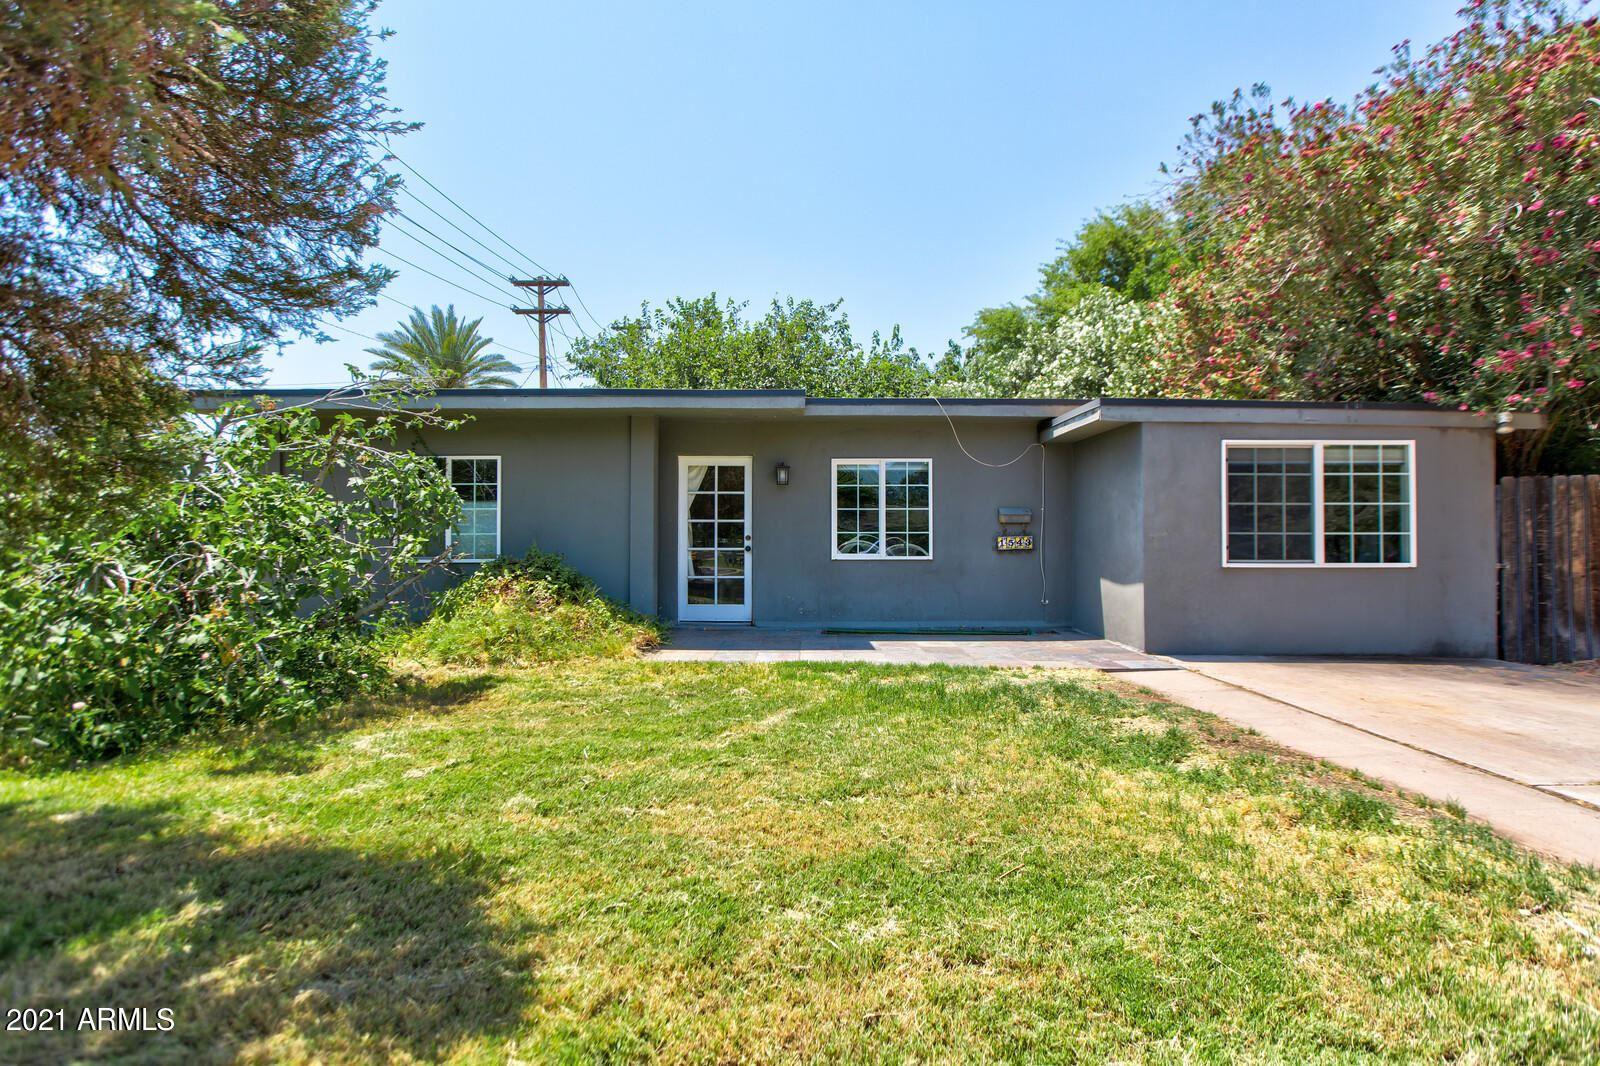 1543 E CEDAR Street, Tempe, AZ 85281 - MLS#: 6253408